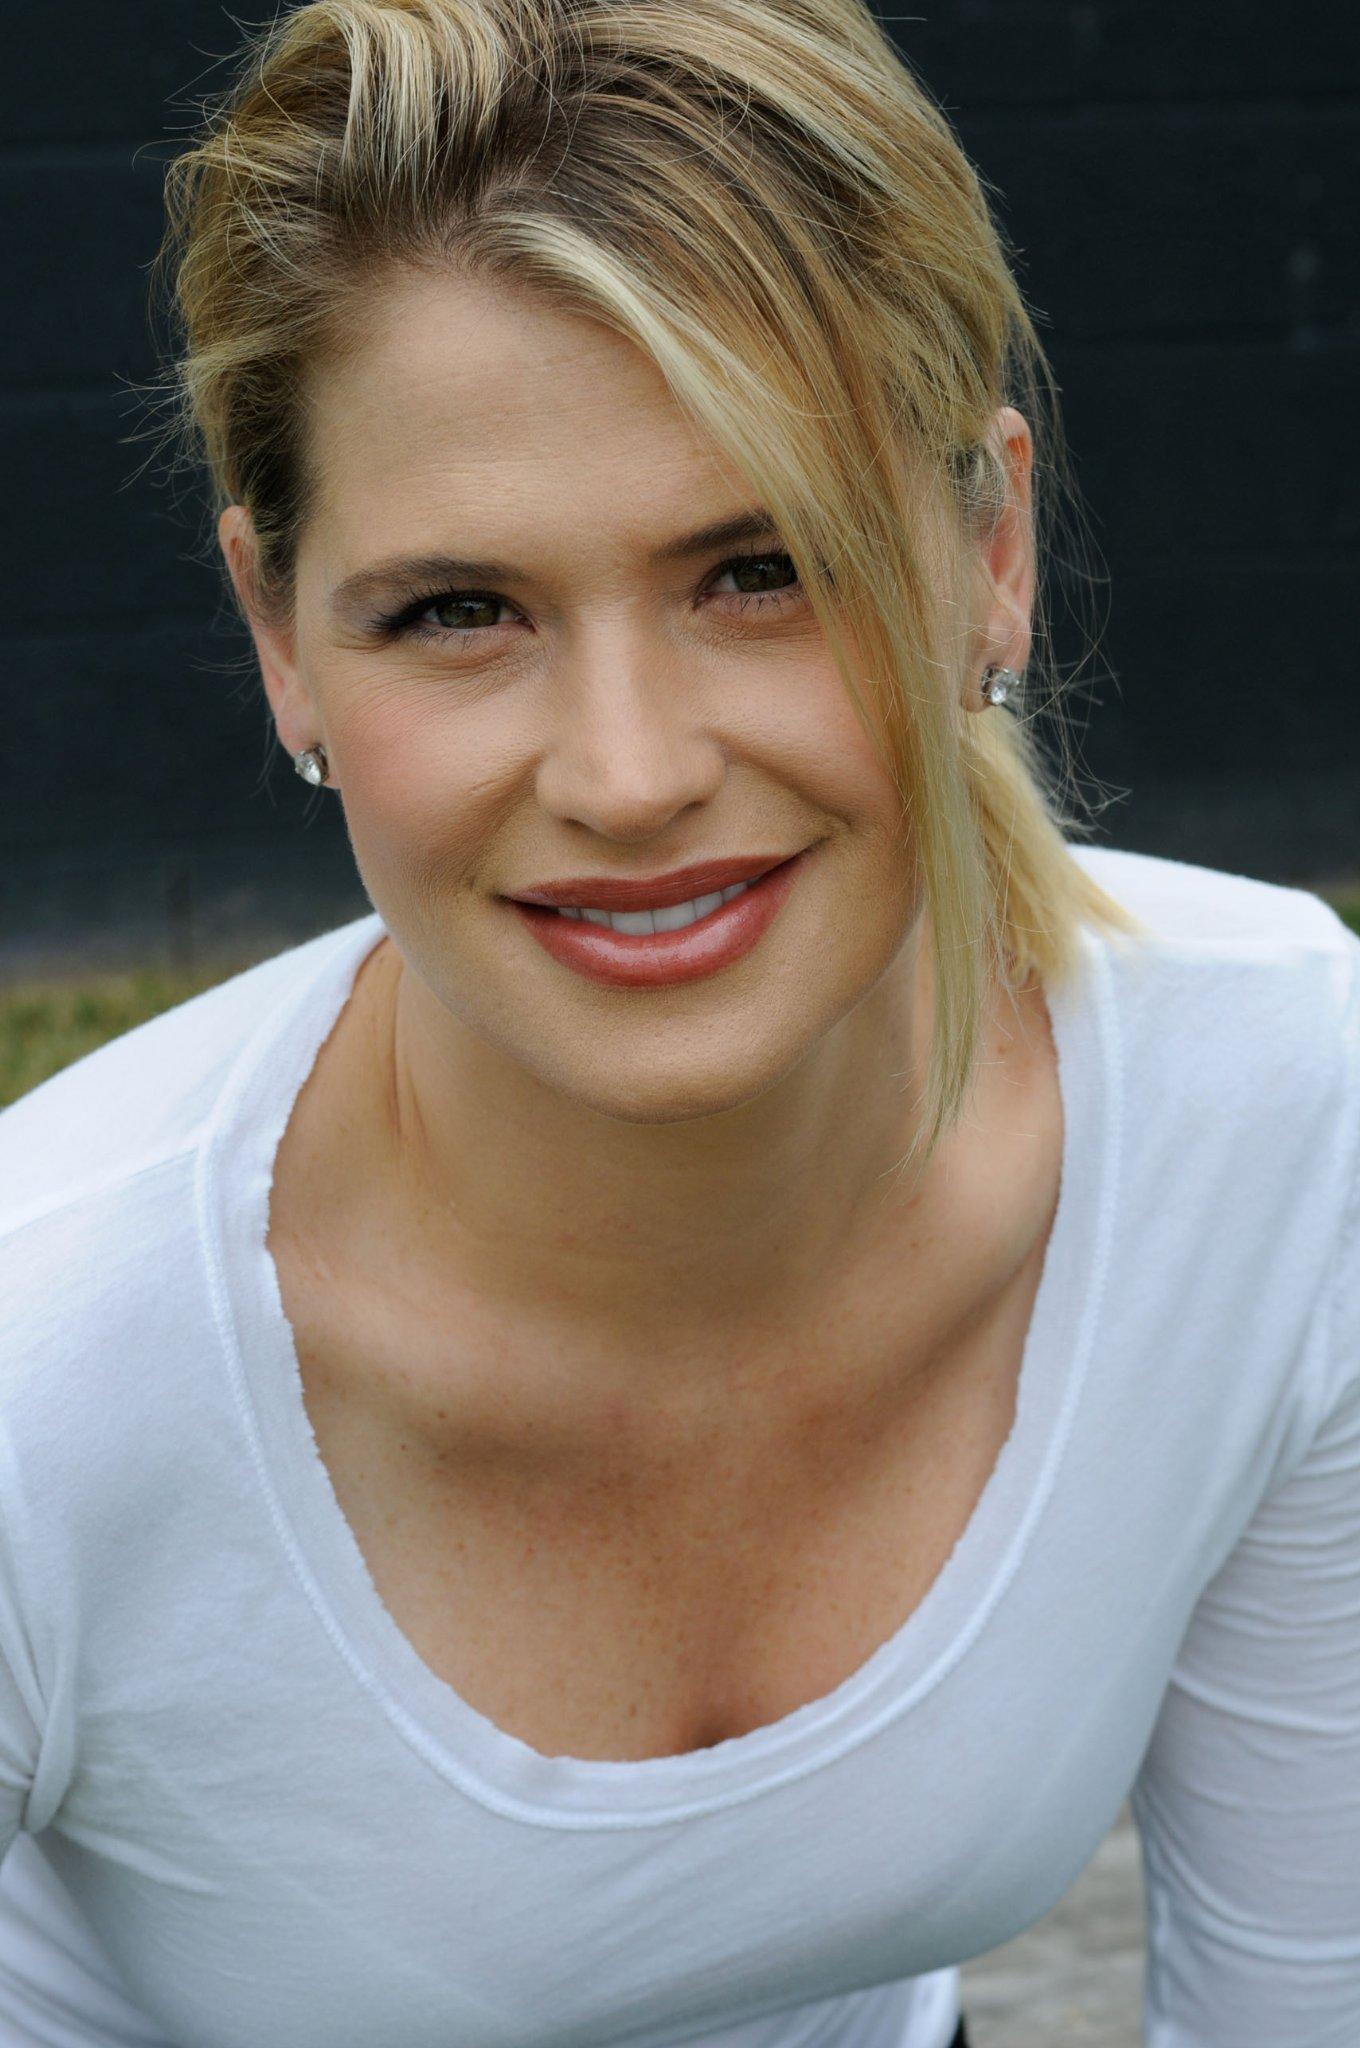 Jena Frumes